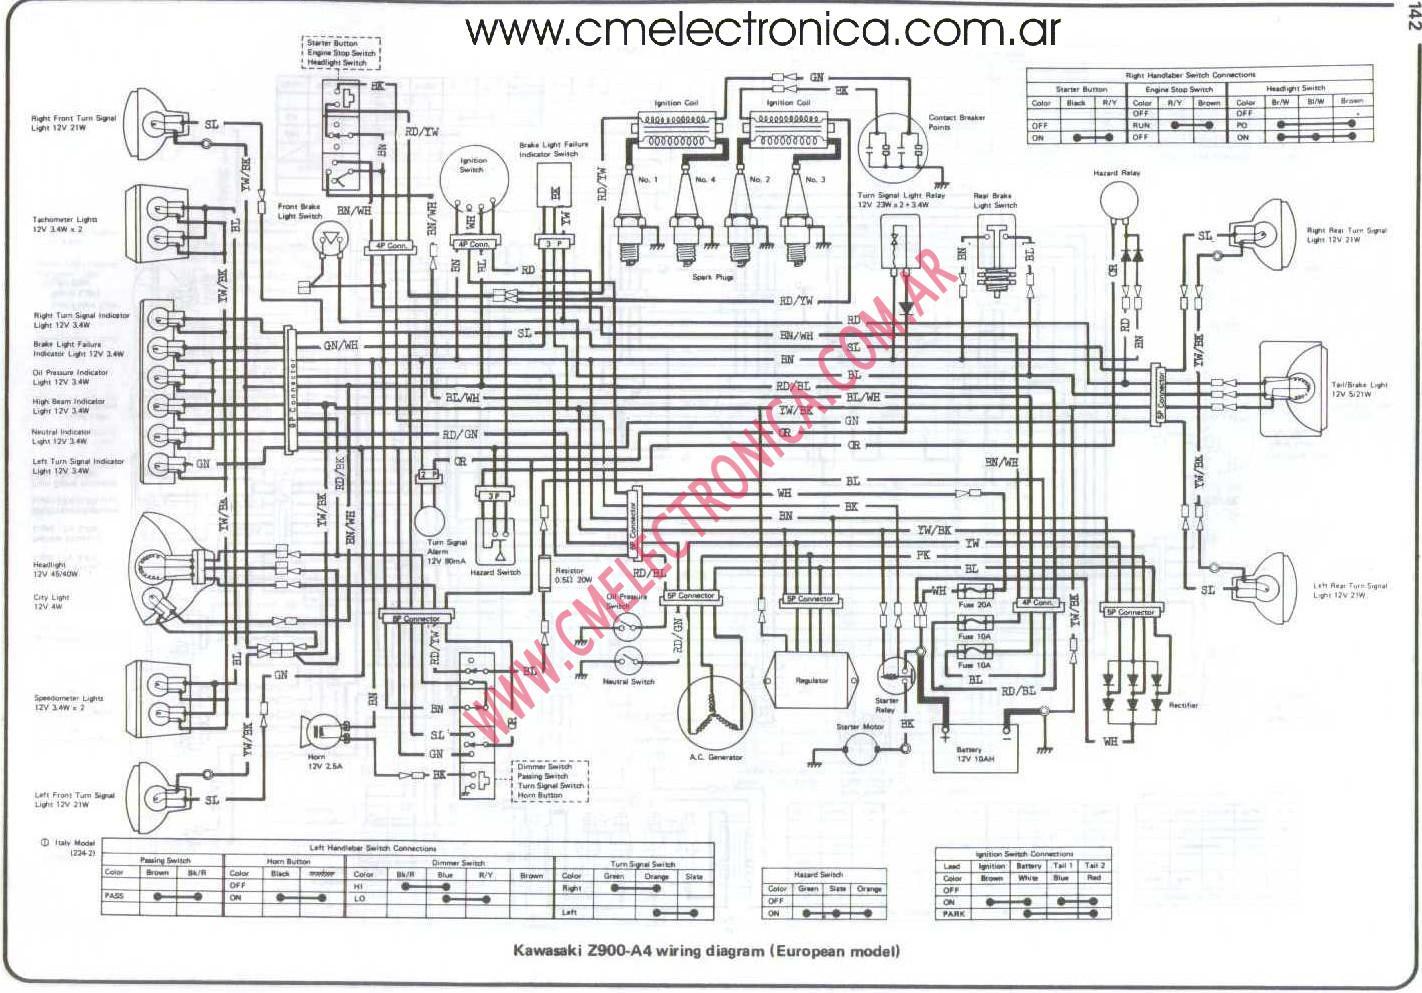 Kawasaki Vulcan 750 Wiring Diagram